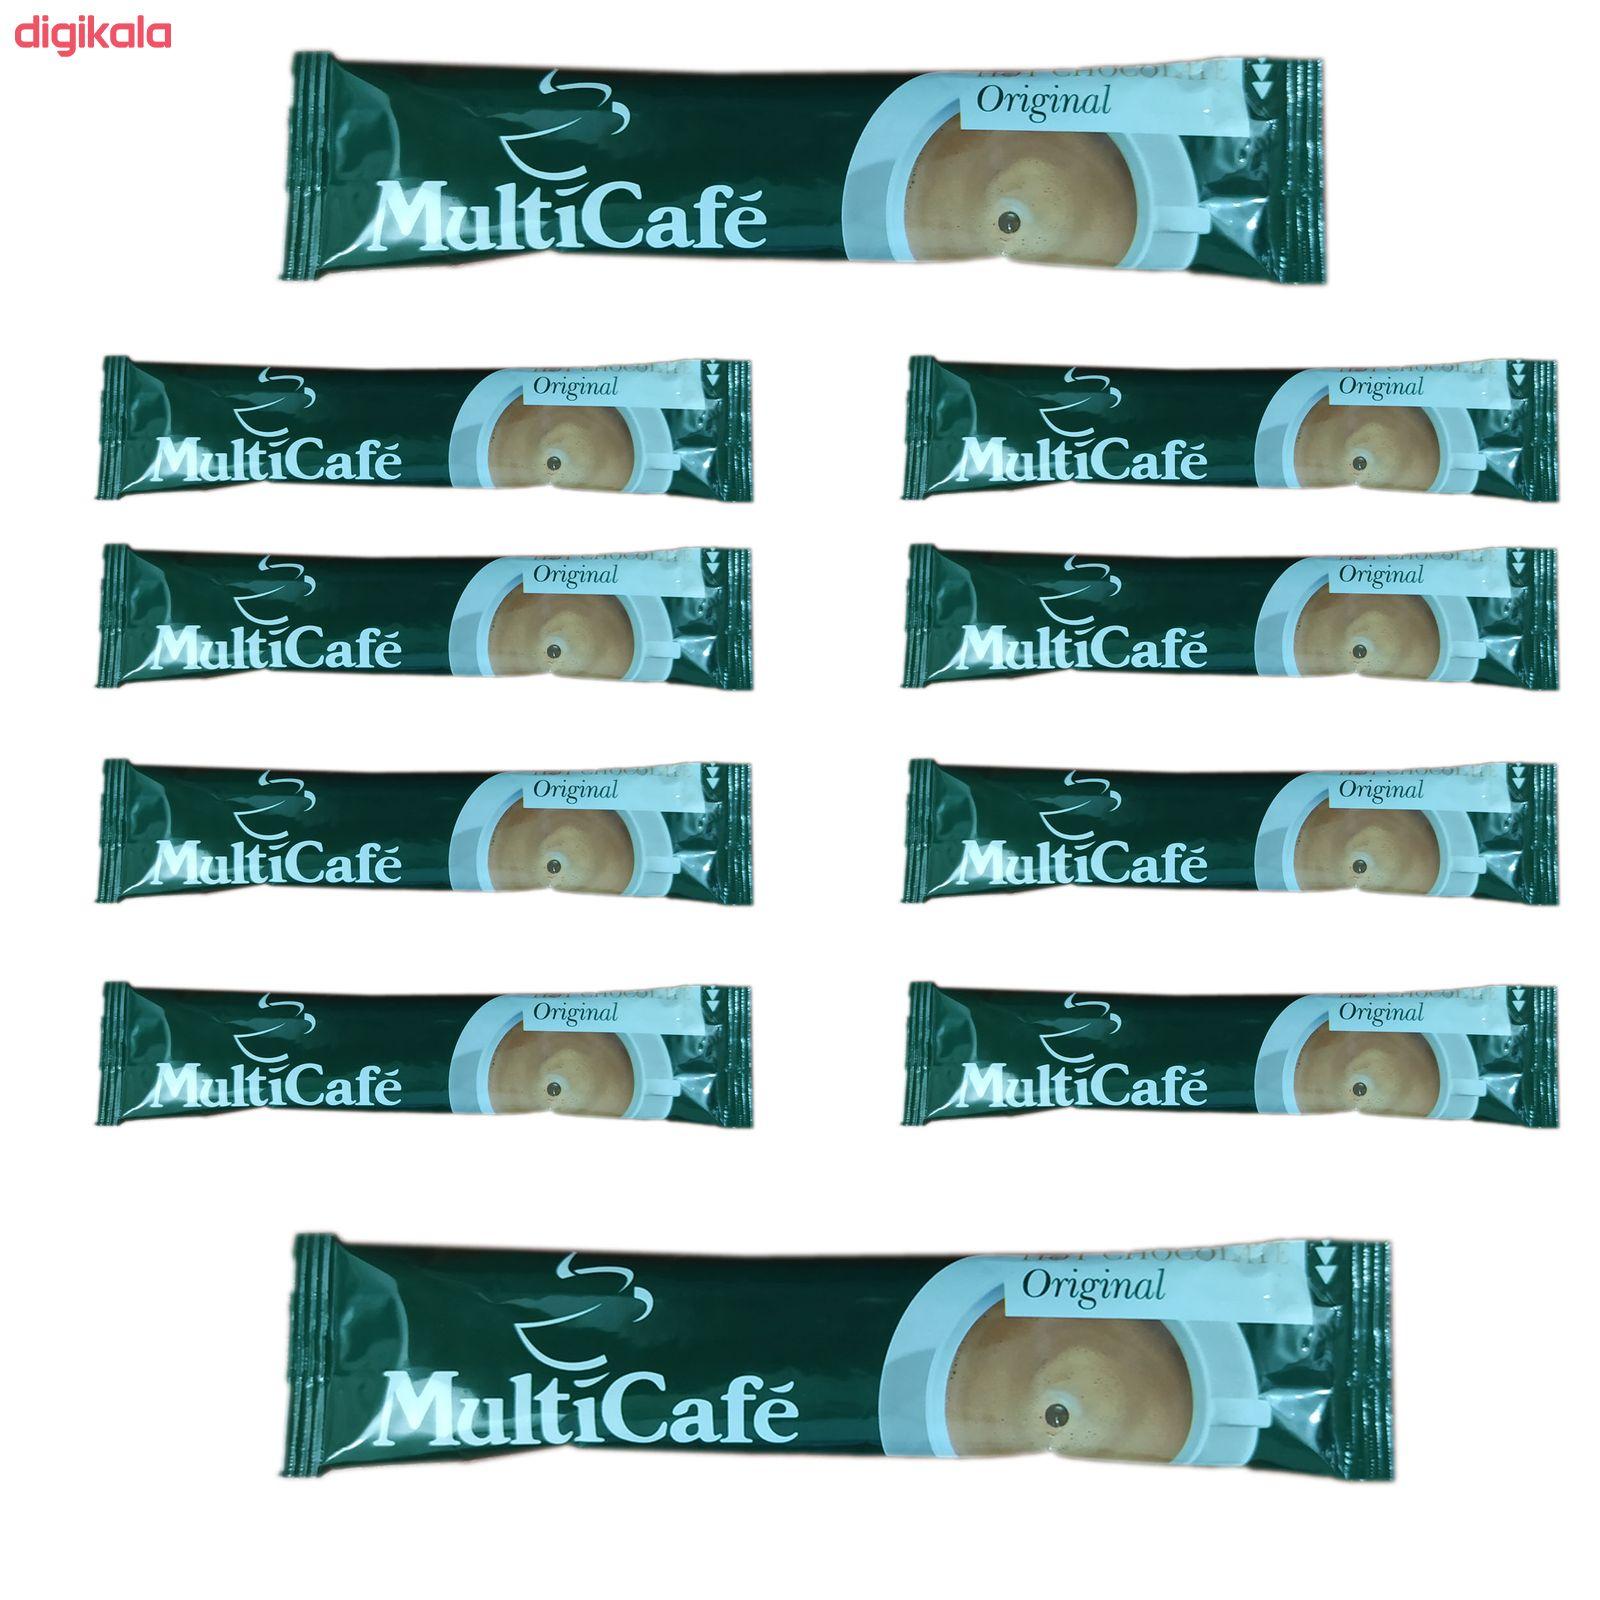 هات چاکلت مولتی کافه بسته 10 عددی main 1 2